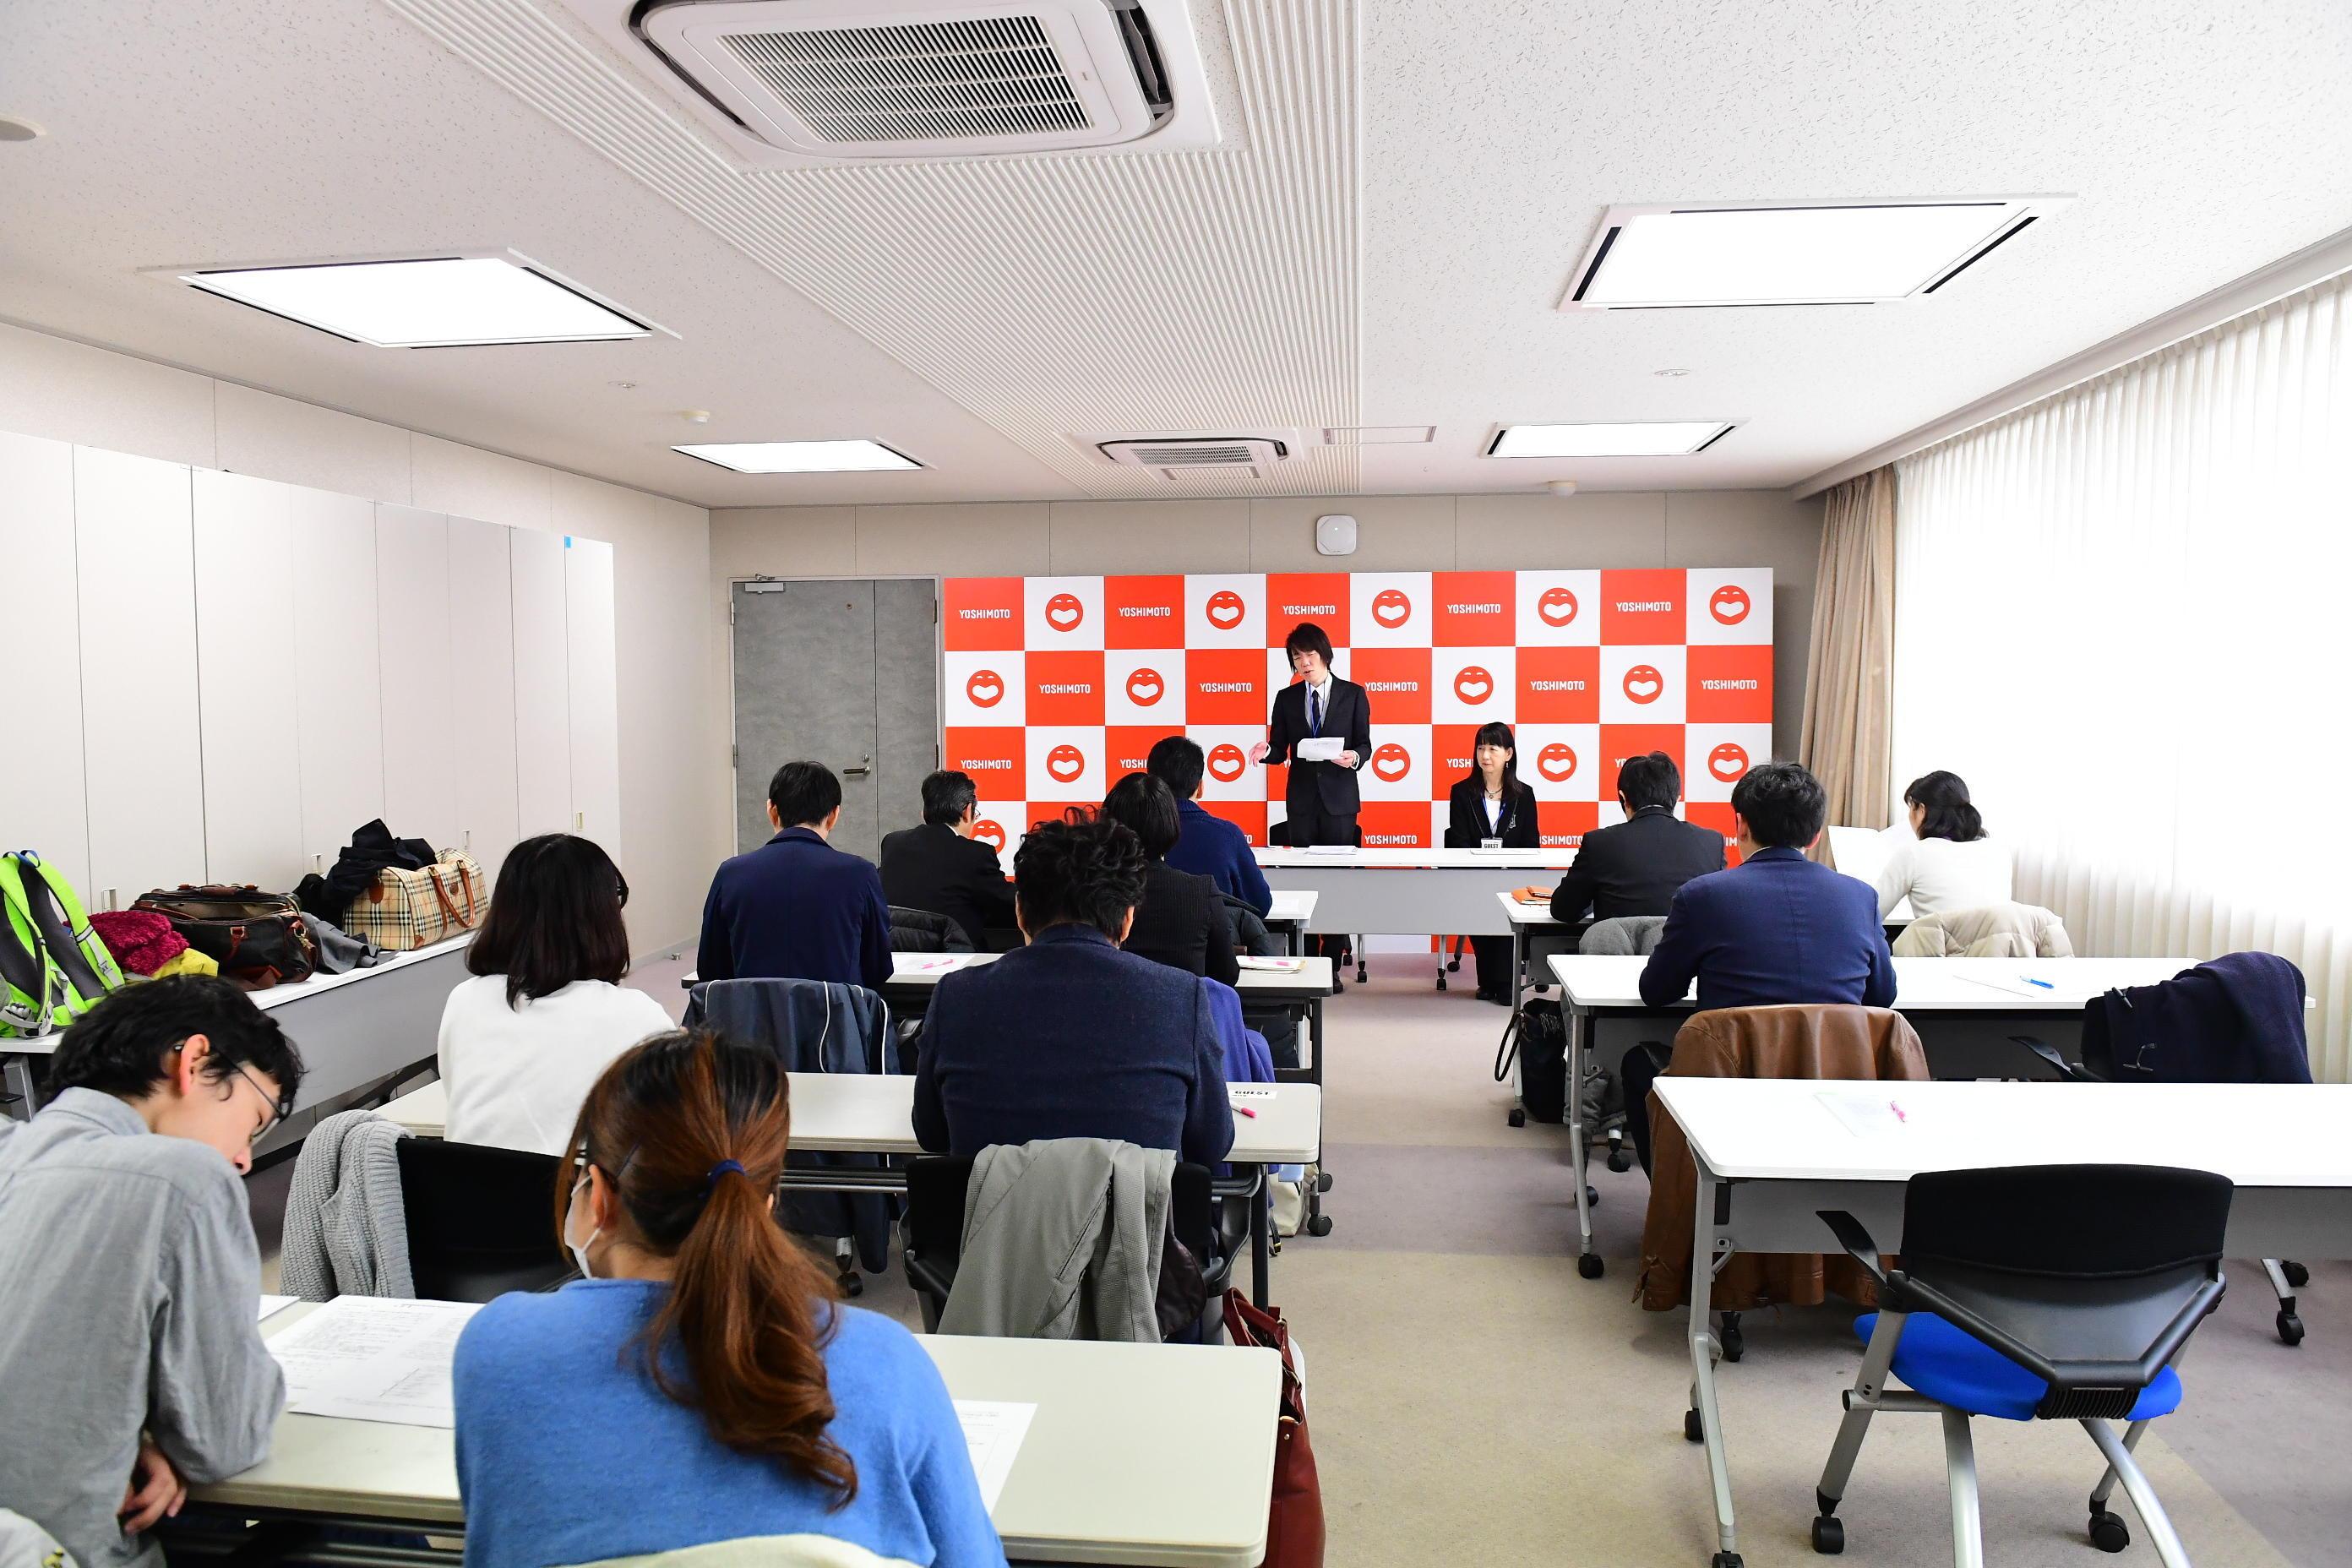 http://news.yoshimoto.co.jp/20170215201605-89d22a9a65c7d9f168a18323160f93c32d949186.jpg